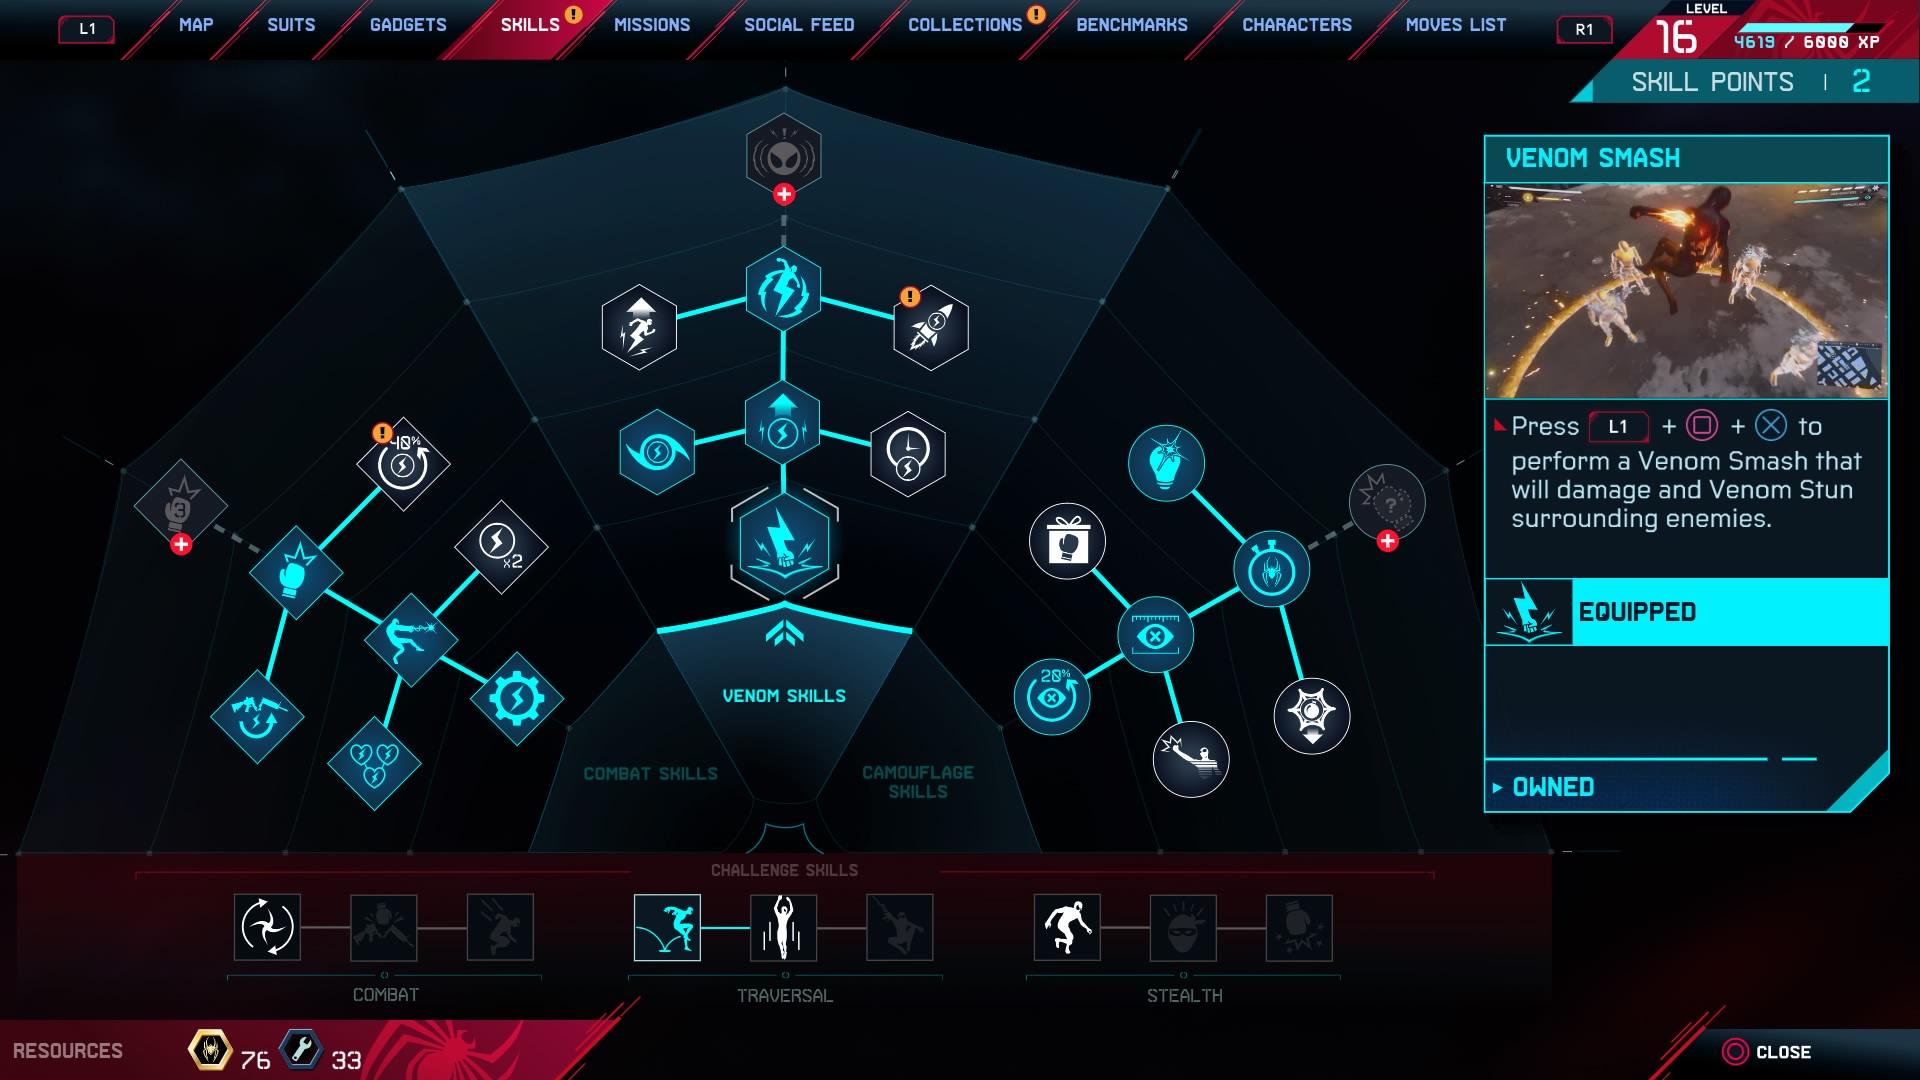 Marvel's Spider-Man: Miles Morales - Skills